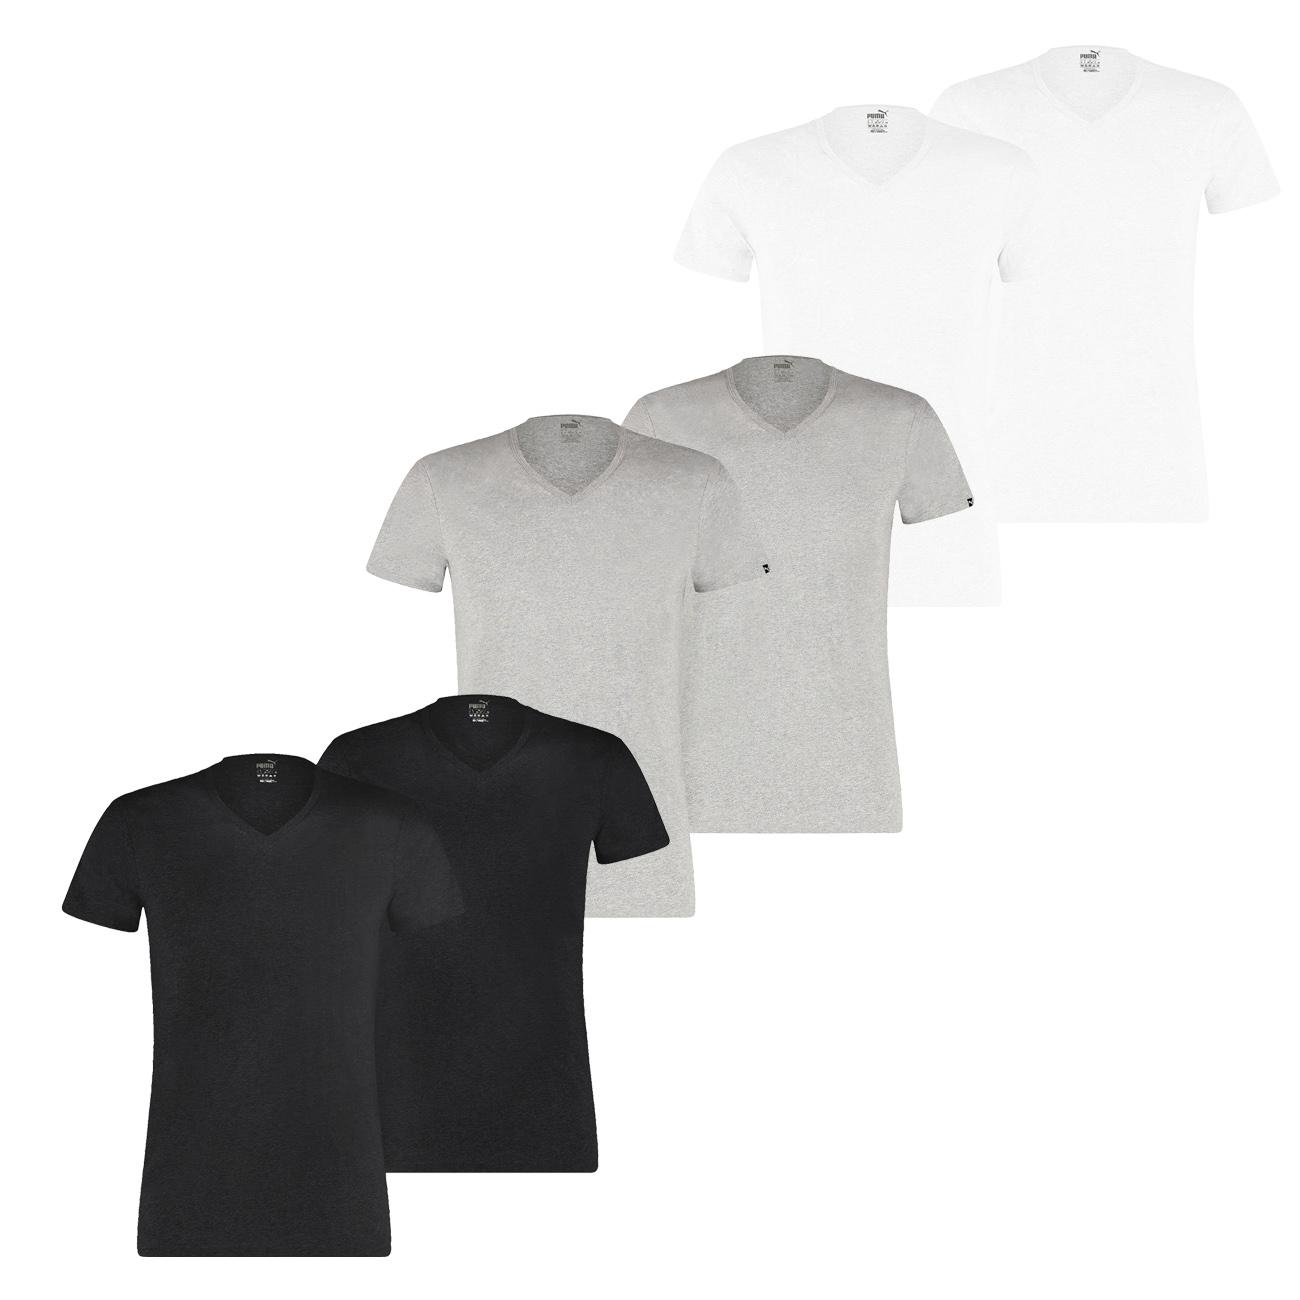 Puma Herren T Shirt BASIC CREW Regular Fit 100% Baumwolle